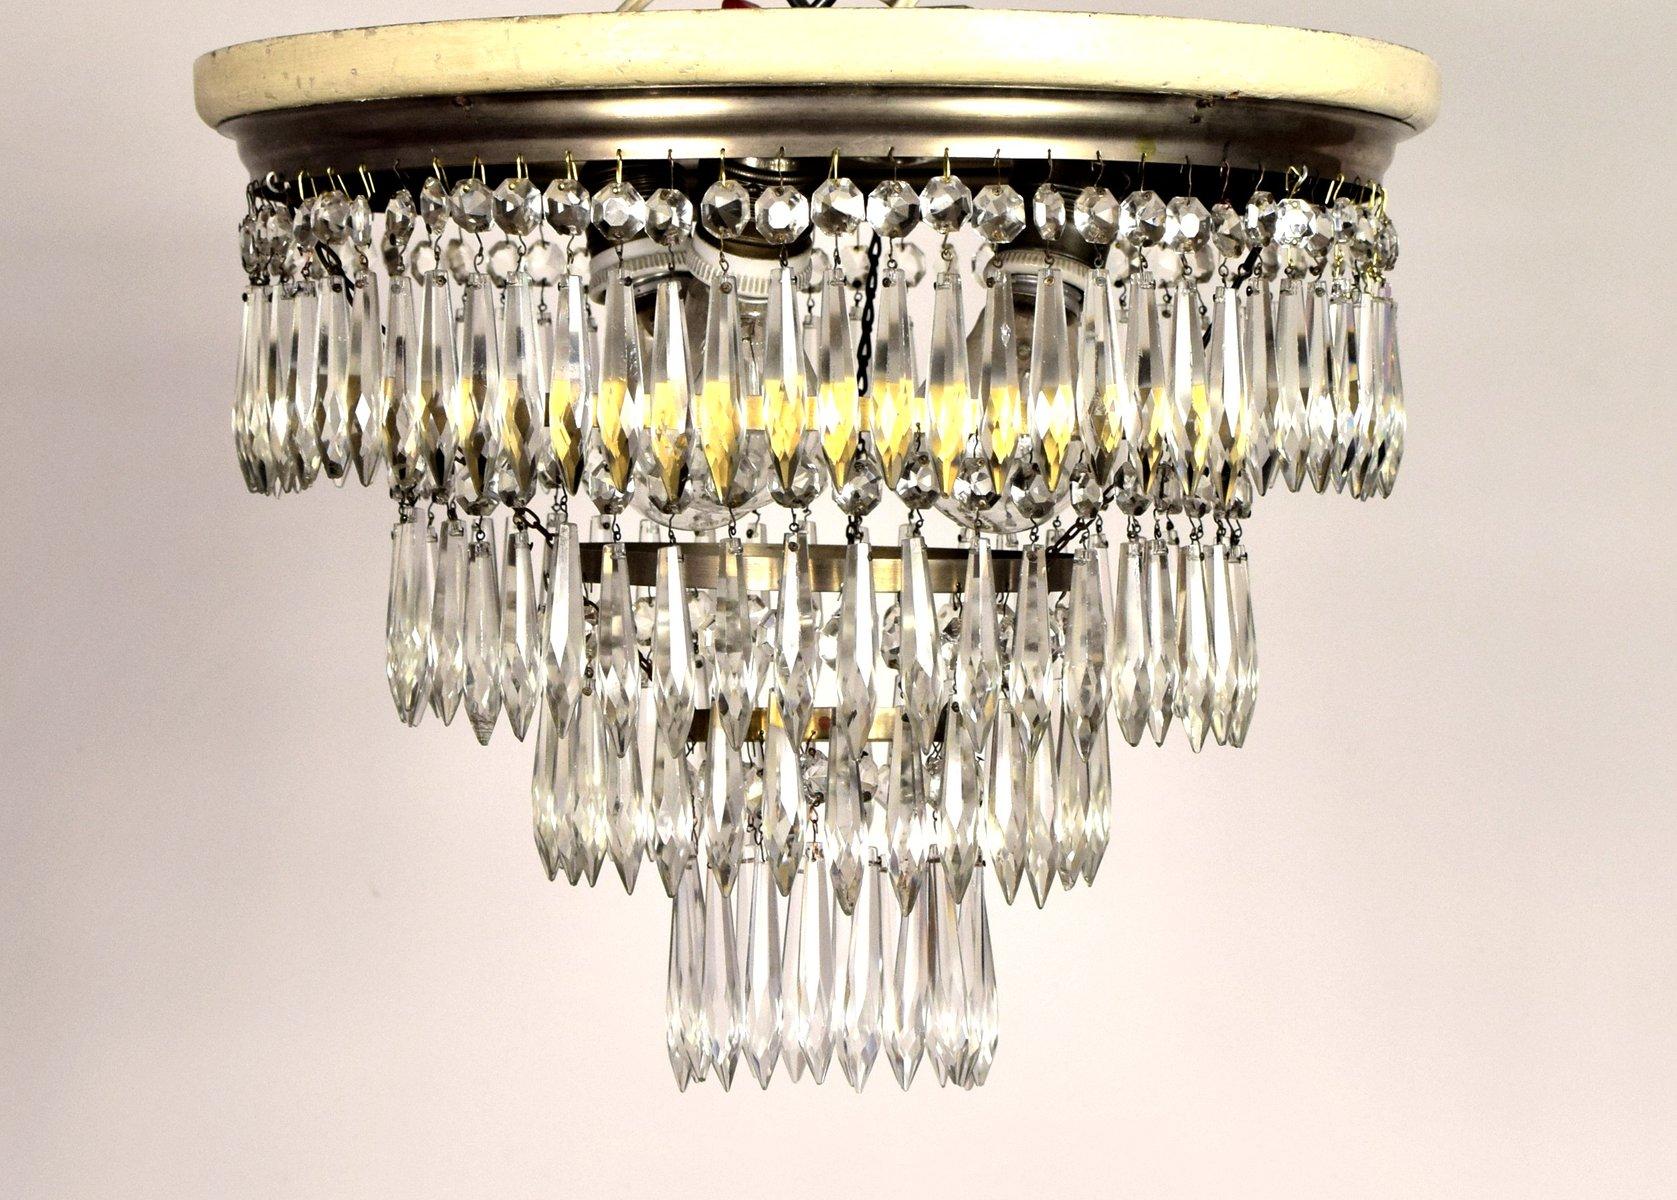 jugendstil deckenlampe mit kristallprismen bei pamono kaufen. Black Bedroom Furniture Sets. Home Design Ideas